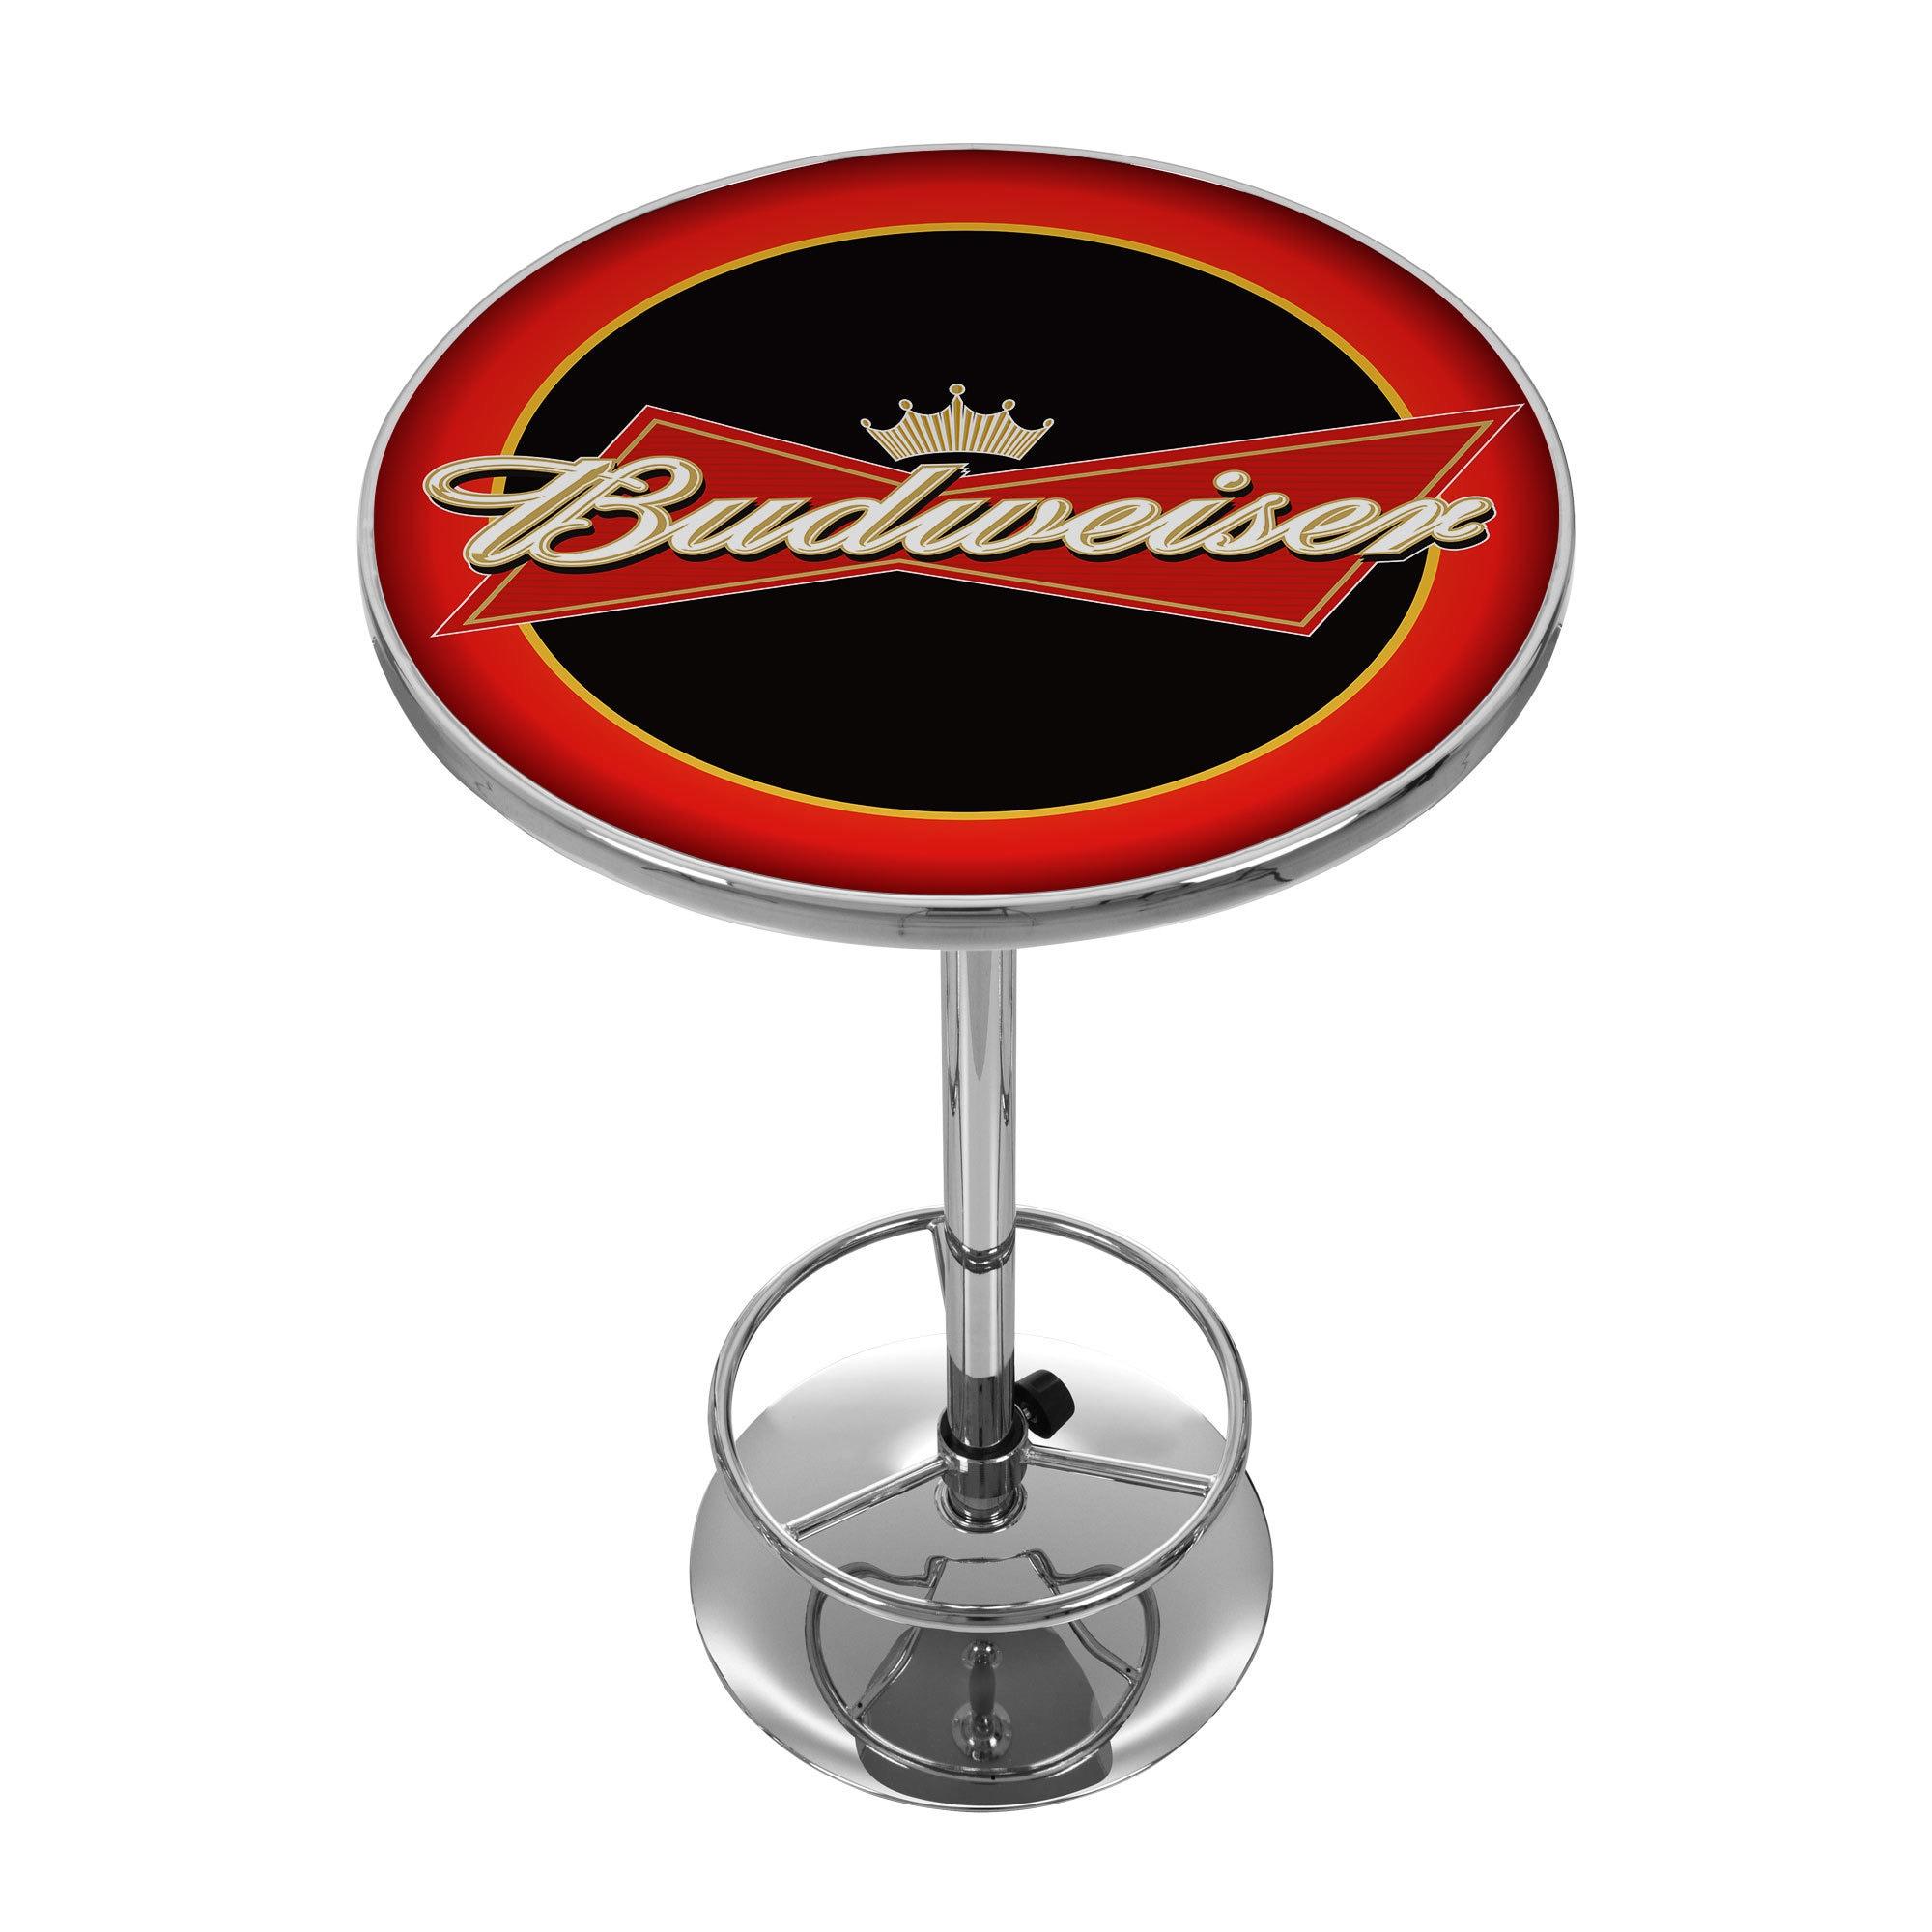 Trademark Gameroom Budweiser Bowtie Red and Black Pub Tab...